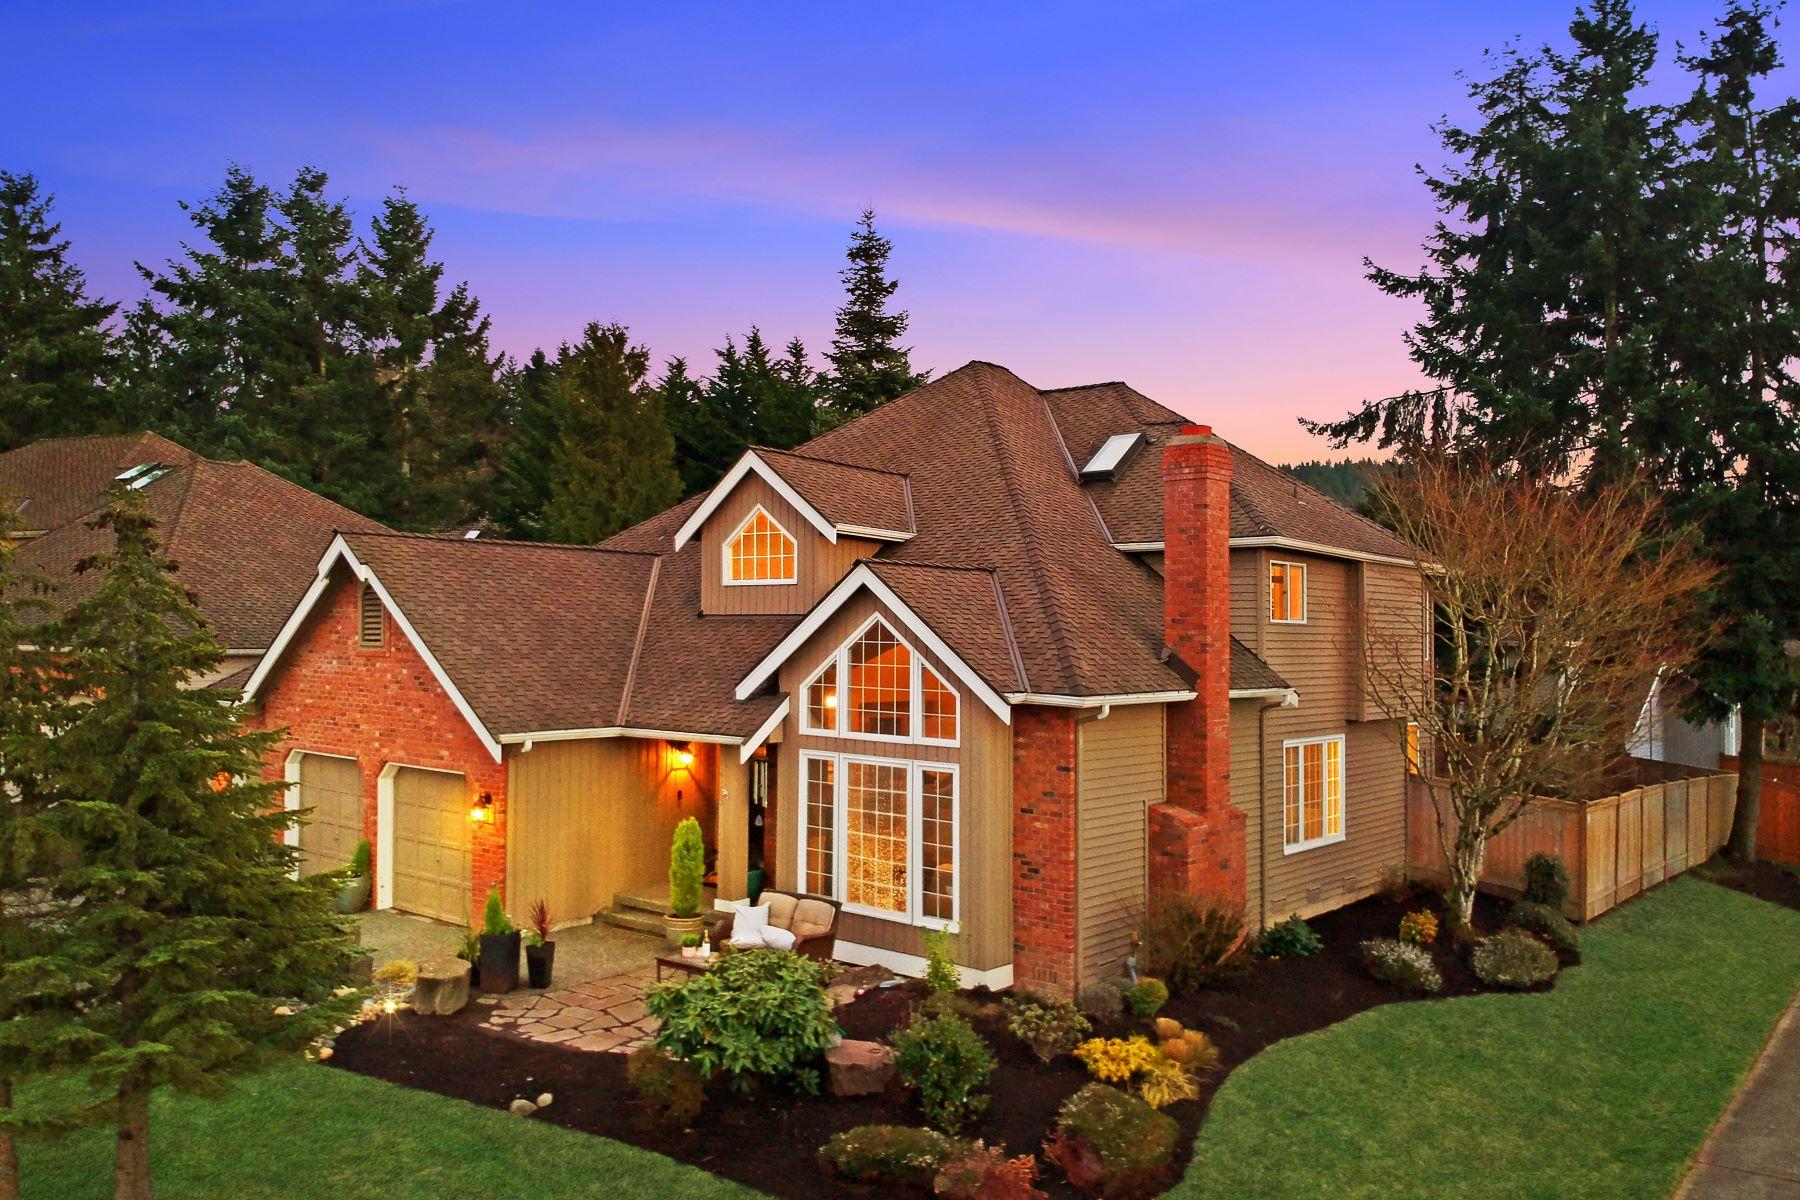 Single Family Homes for Sale at 14303 SE 77th Ct, Newcastle, WA 98059 14303 SE 77th Ct Newcastle, Washington 98059 United States